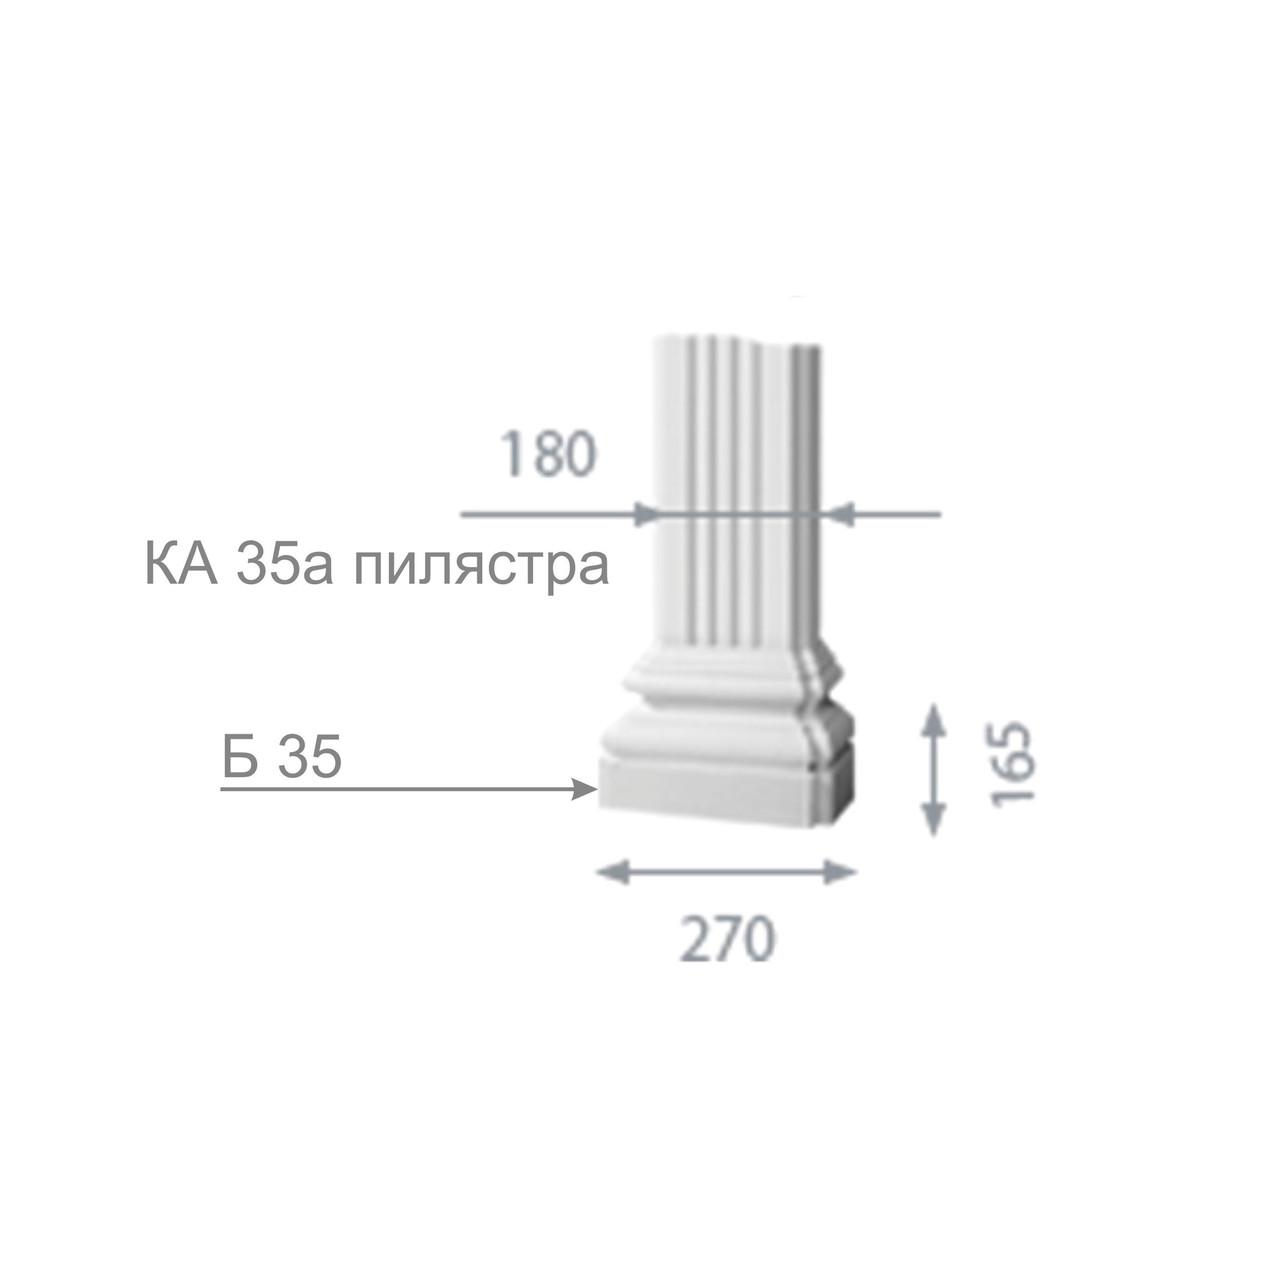 База пилястры б 35